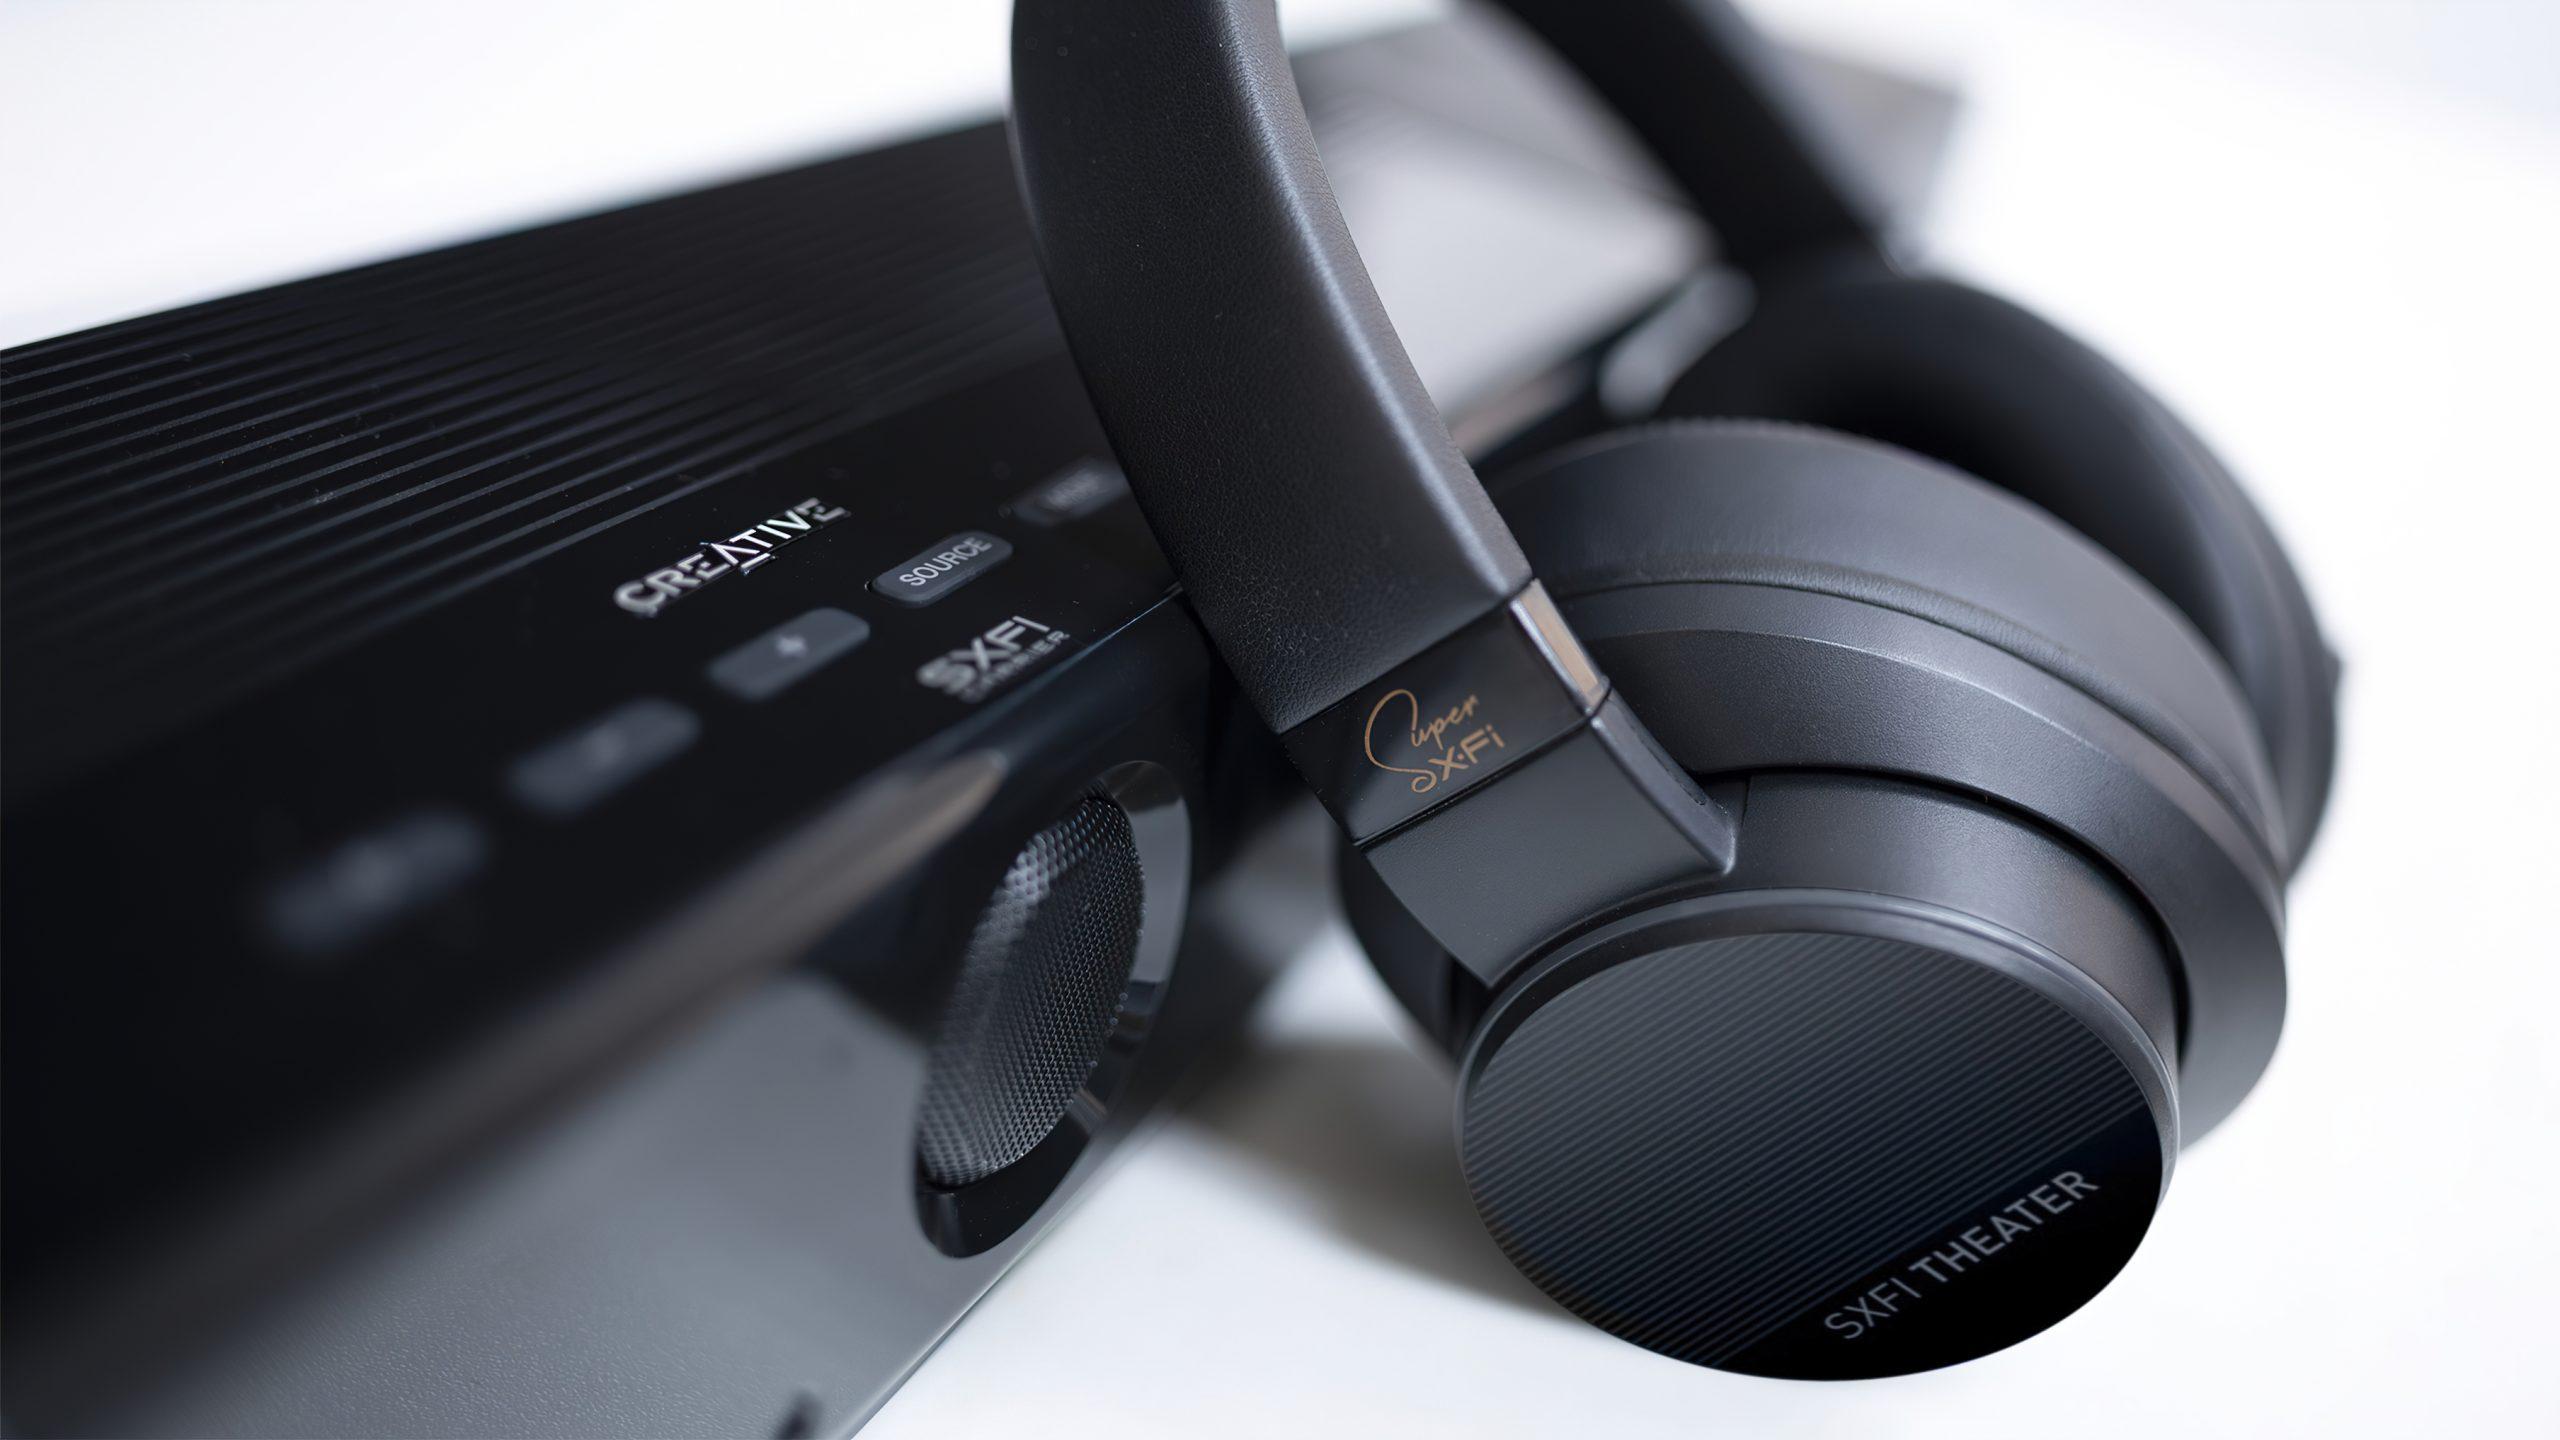 Creative SXFI Carrier headphones